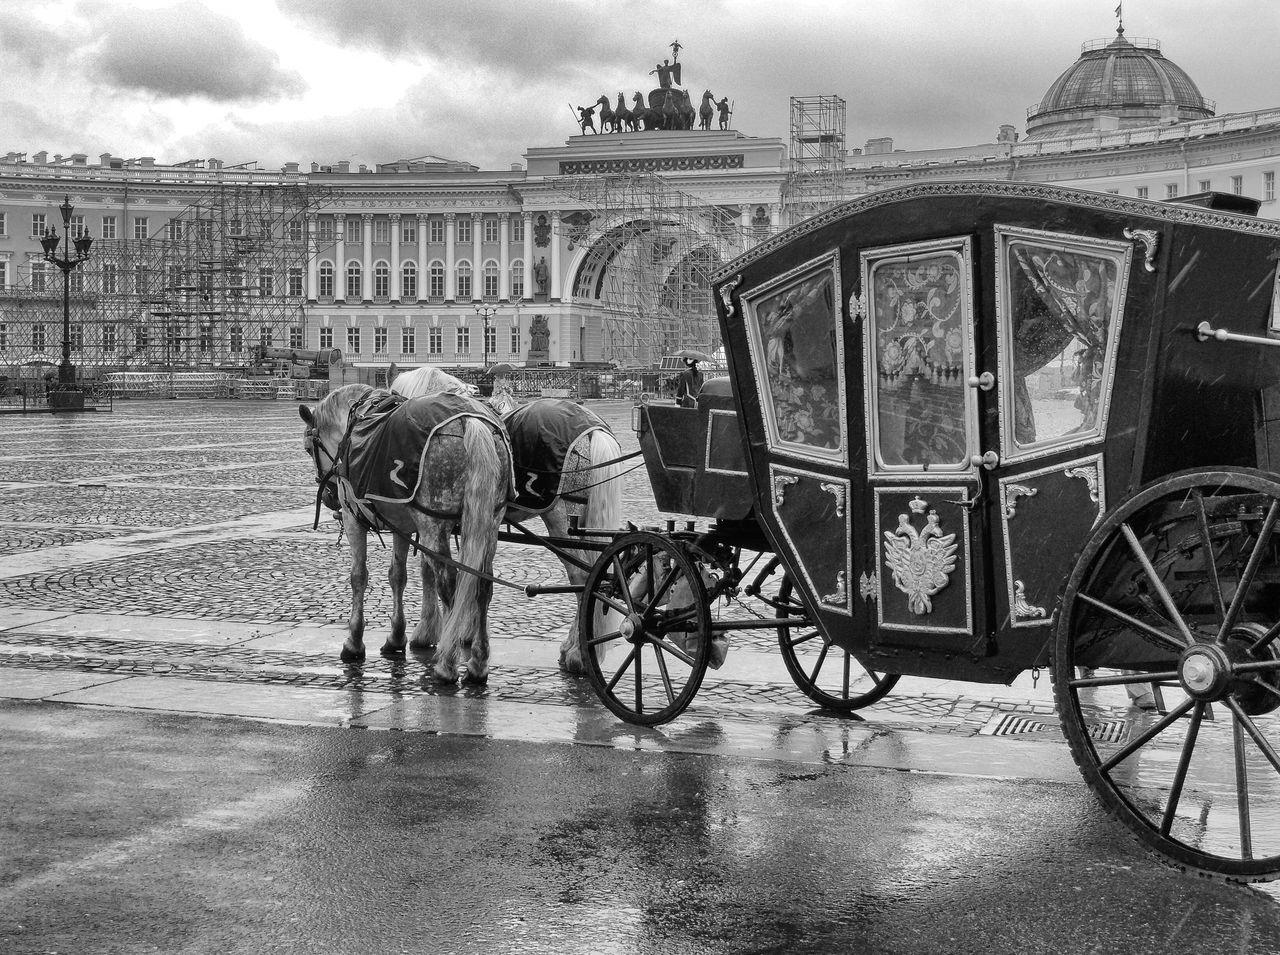 Carriage Cinderella Fairytale  Horse Horse Cart Outdoors Rainy Day Russia Saint Petersburg